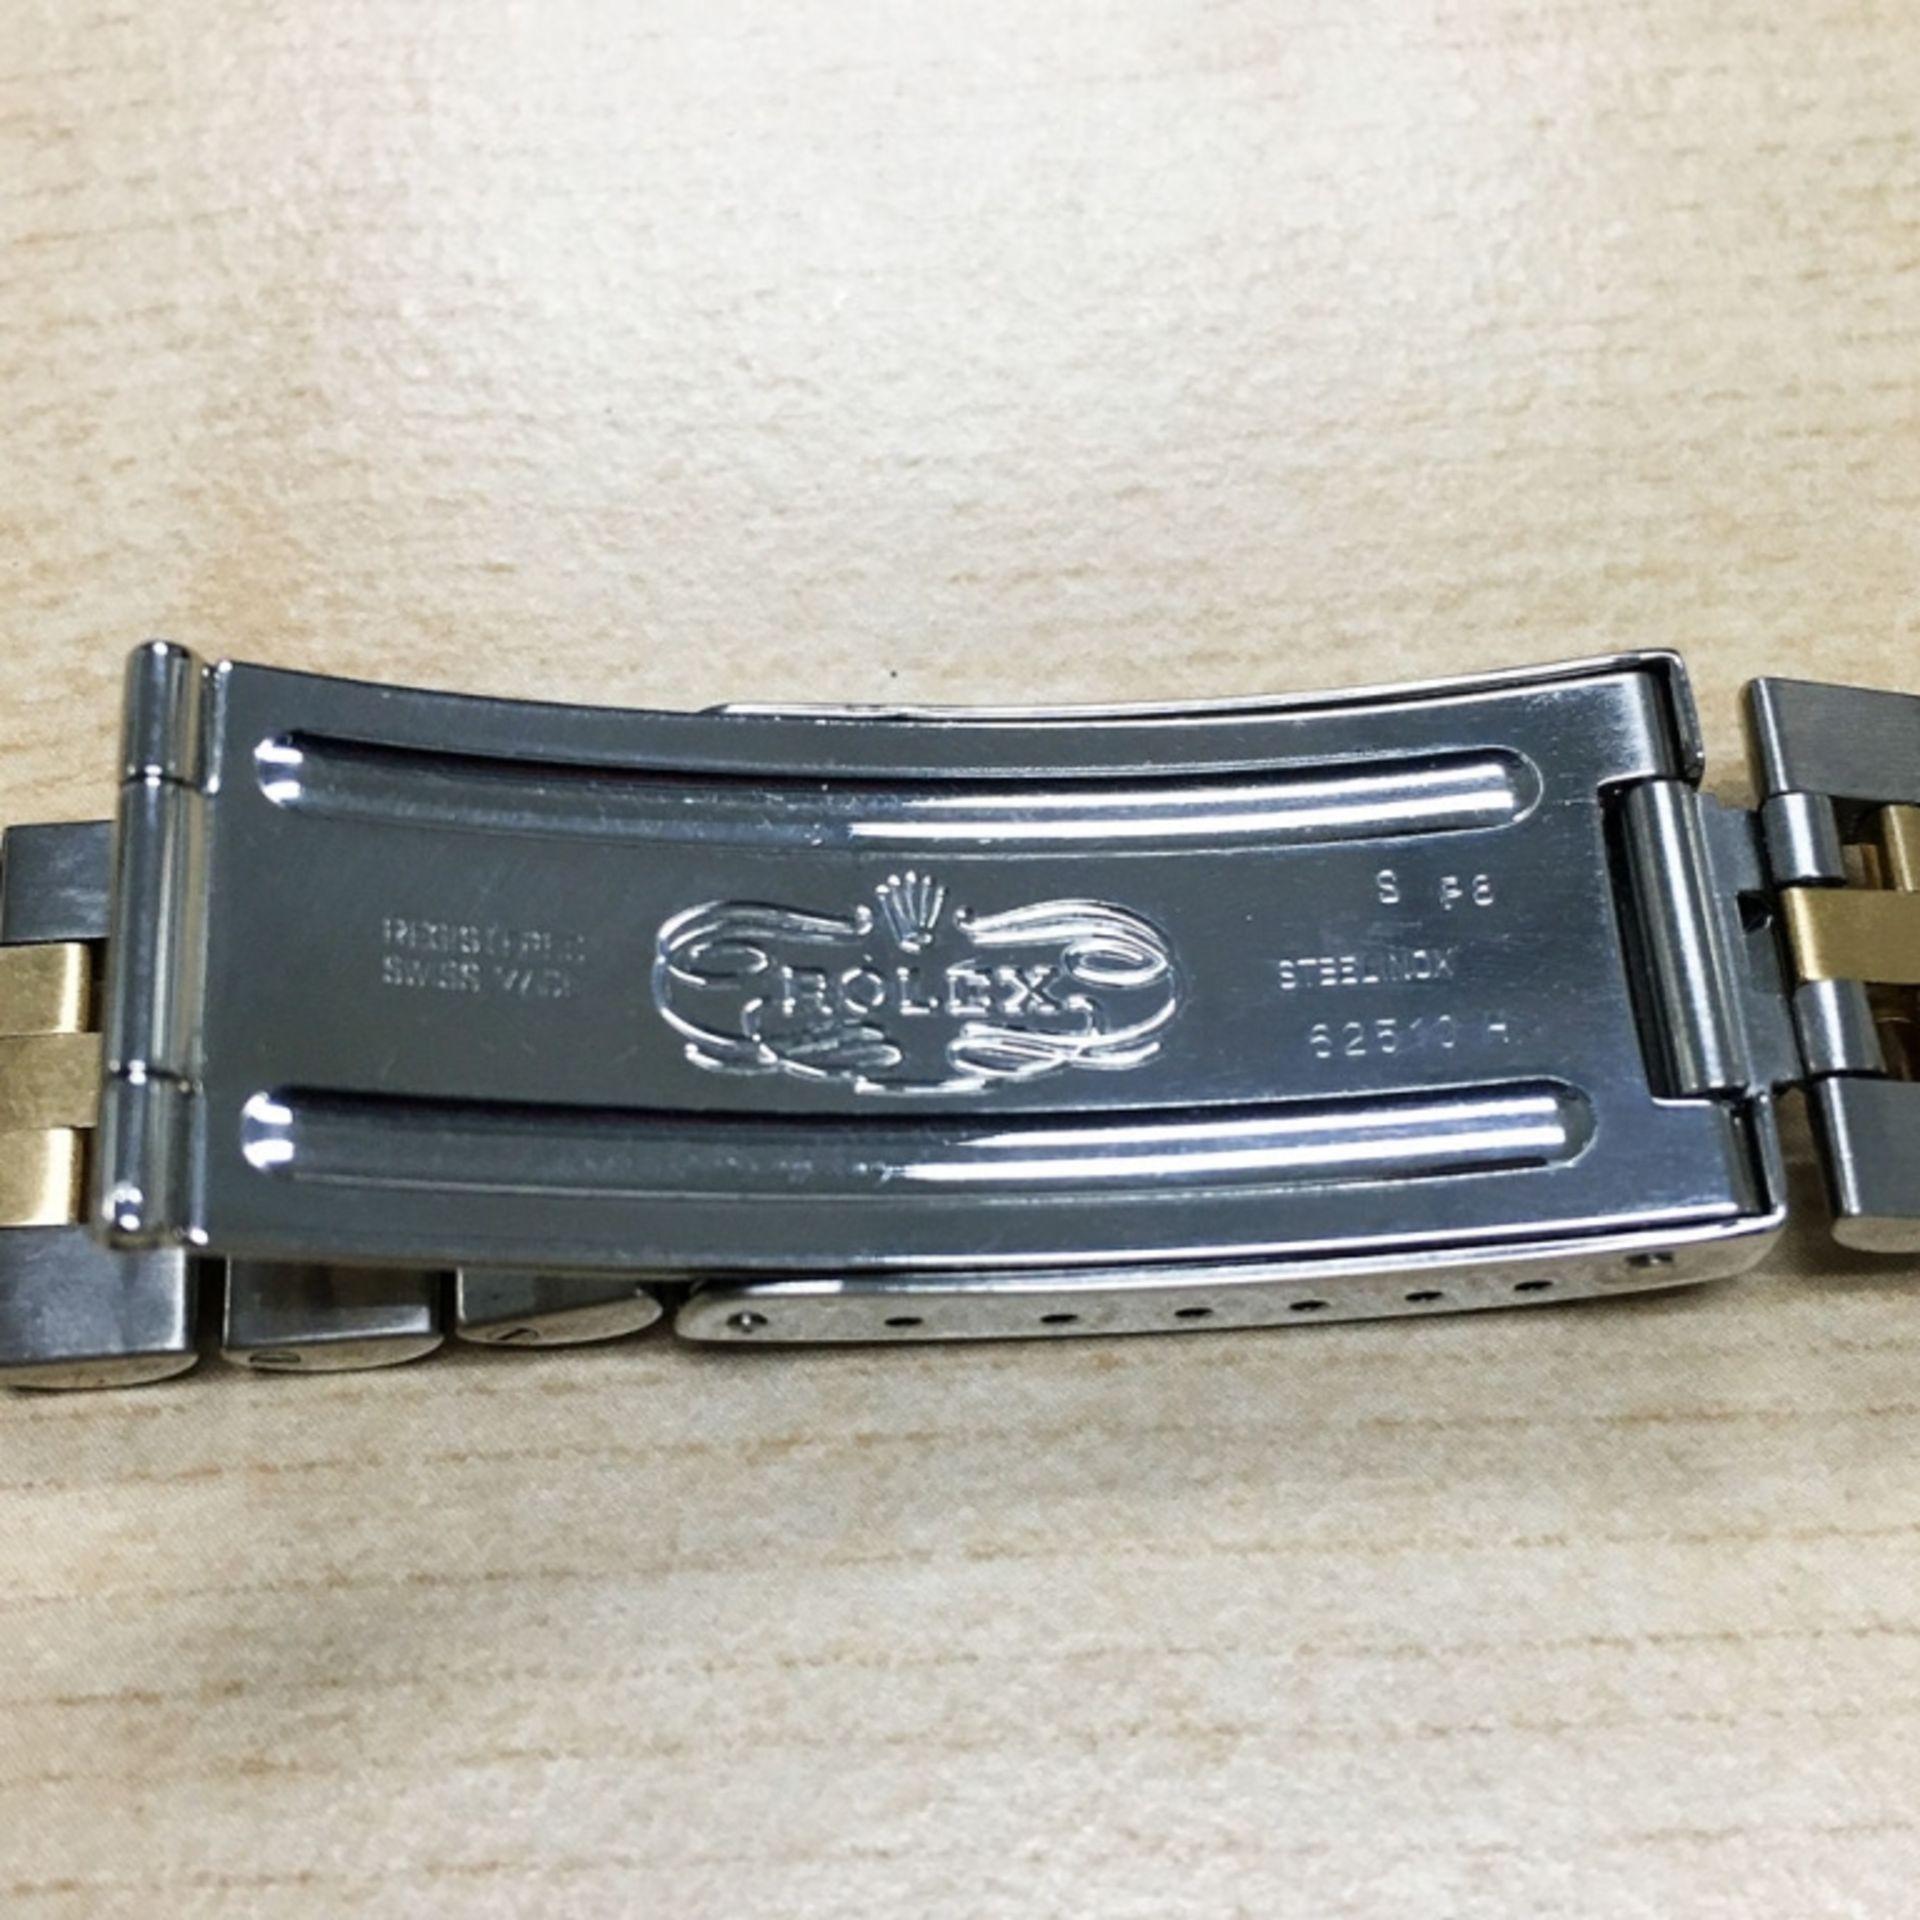 Rolex DateJust 36MM 1.50ct Diamond Wristwatch - Image 5 of 7